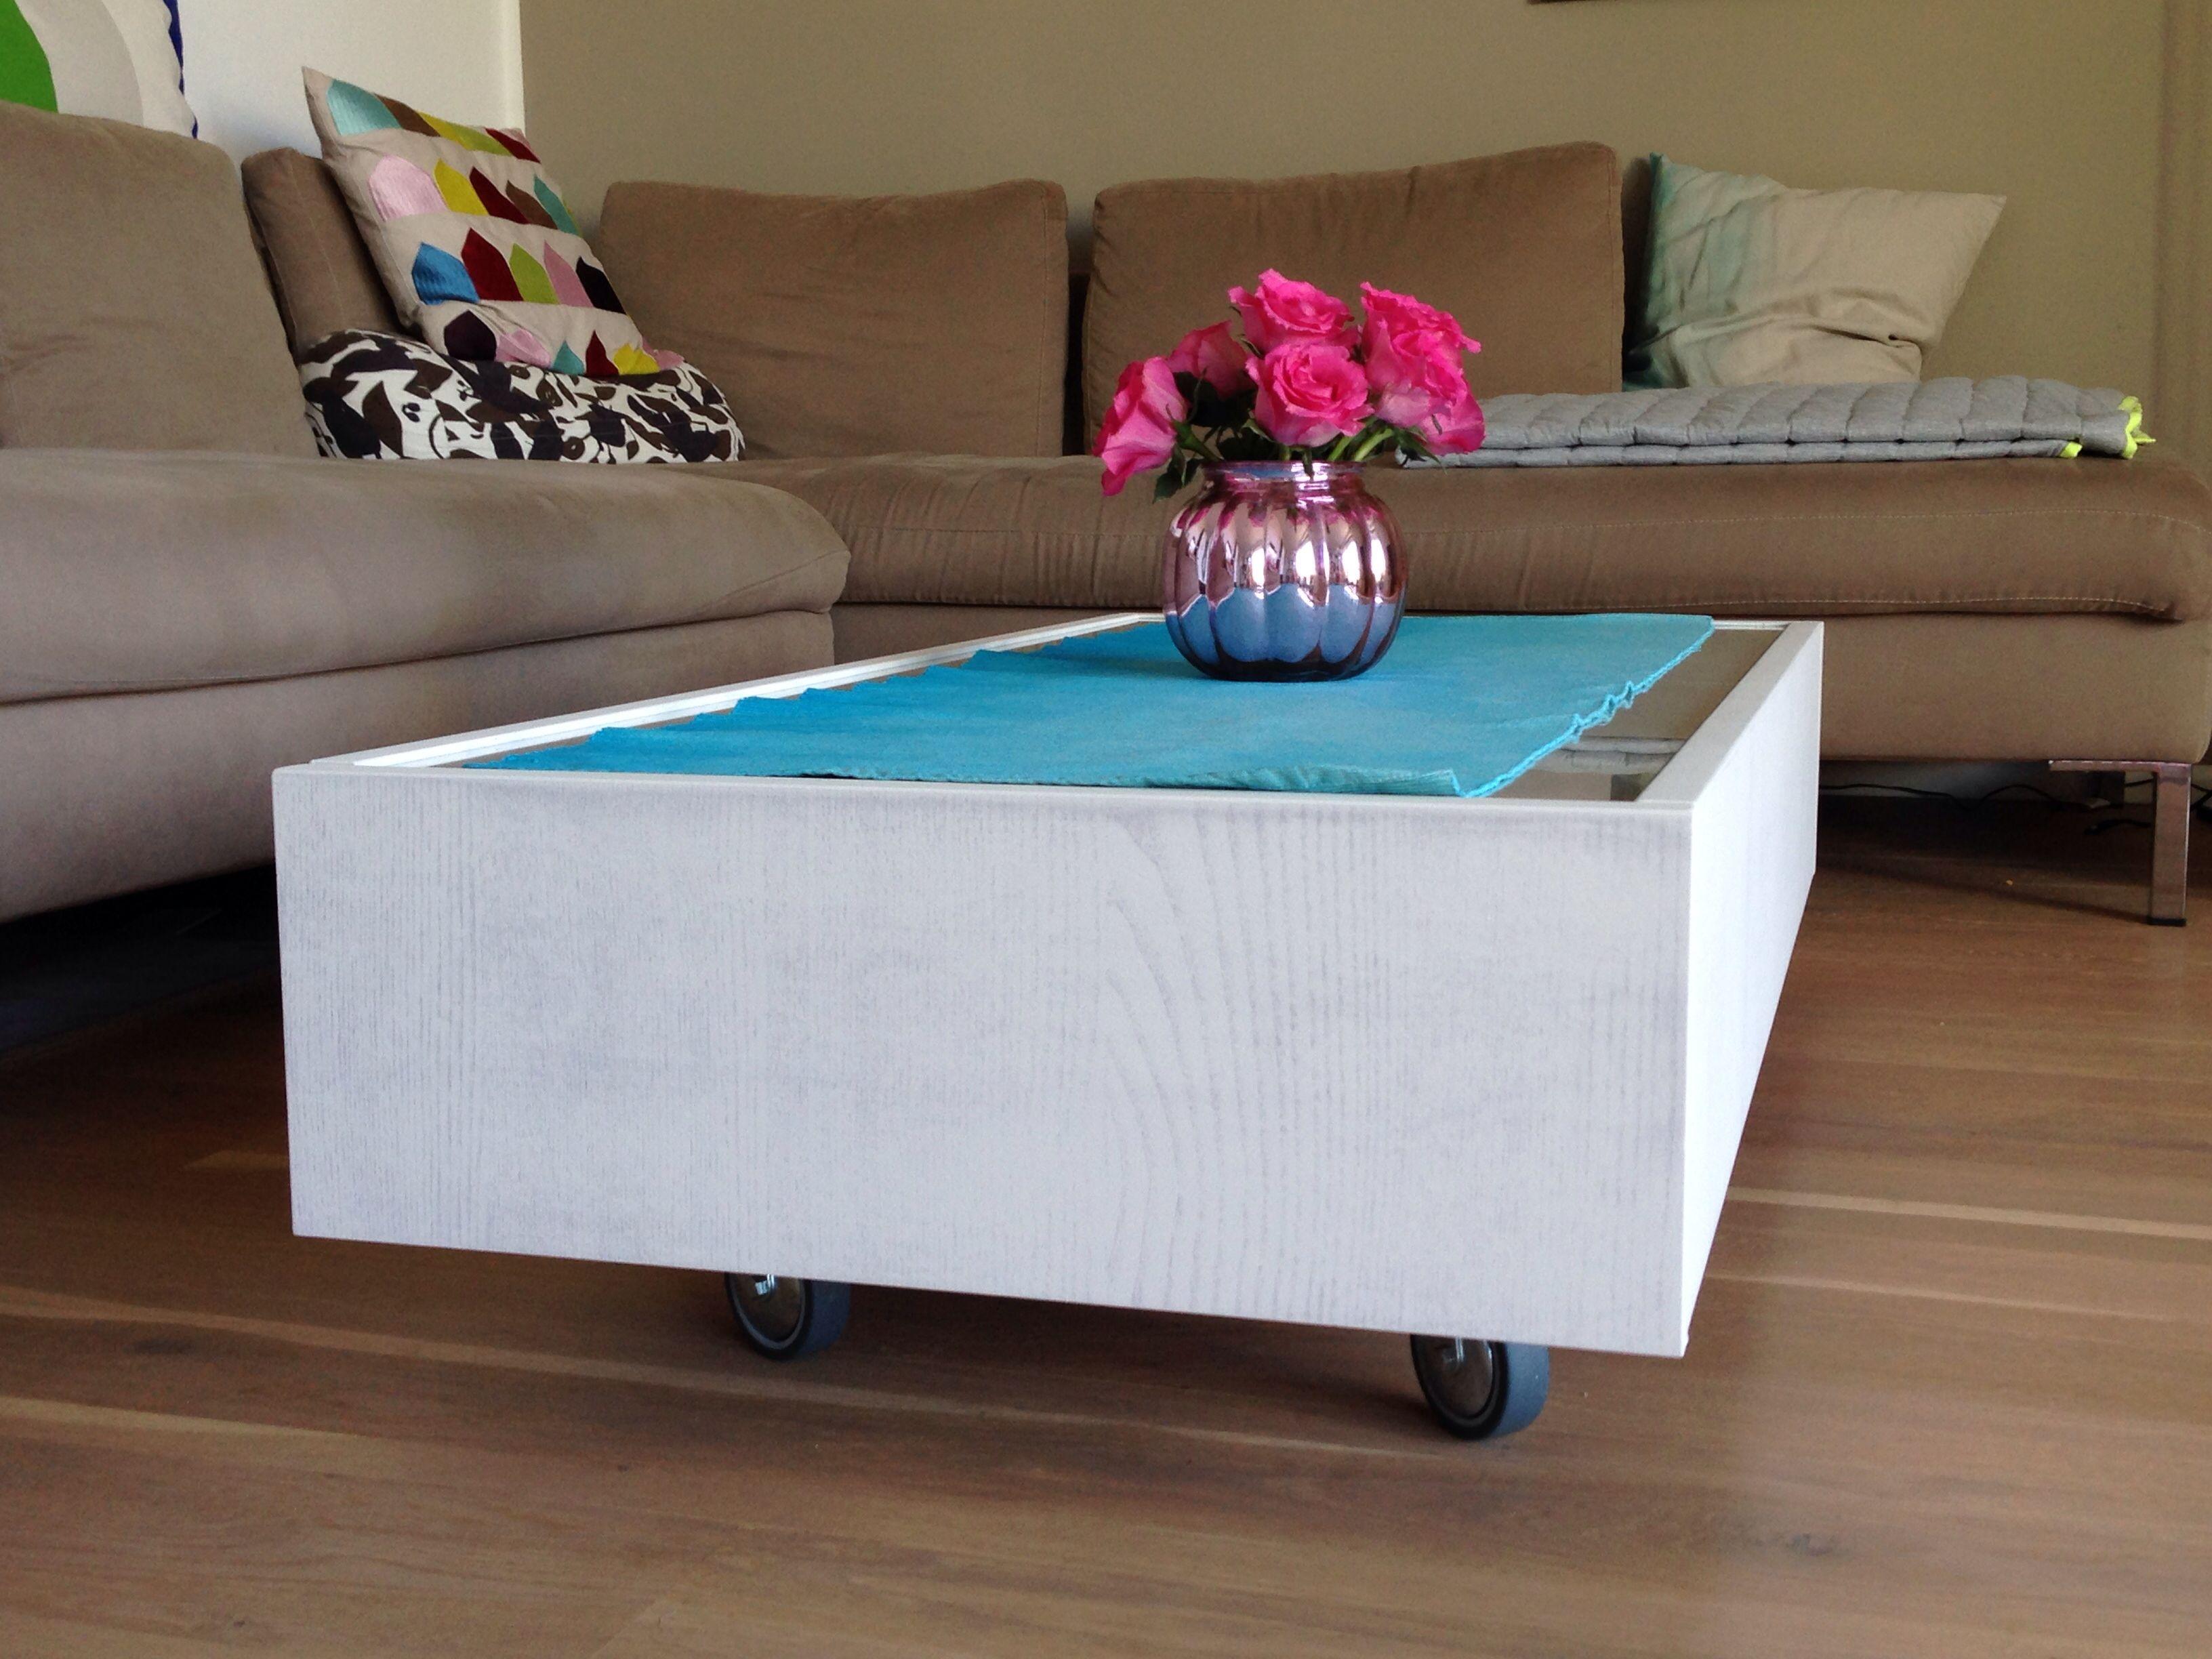 Ikea Wohnzimmertisch ~ Top des idées diy avec frosta ikea hack design table and salons